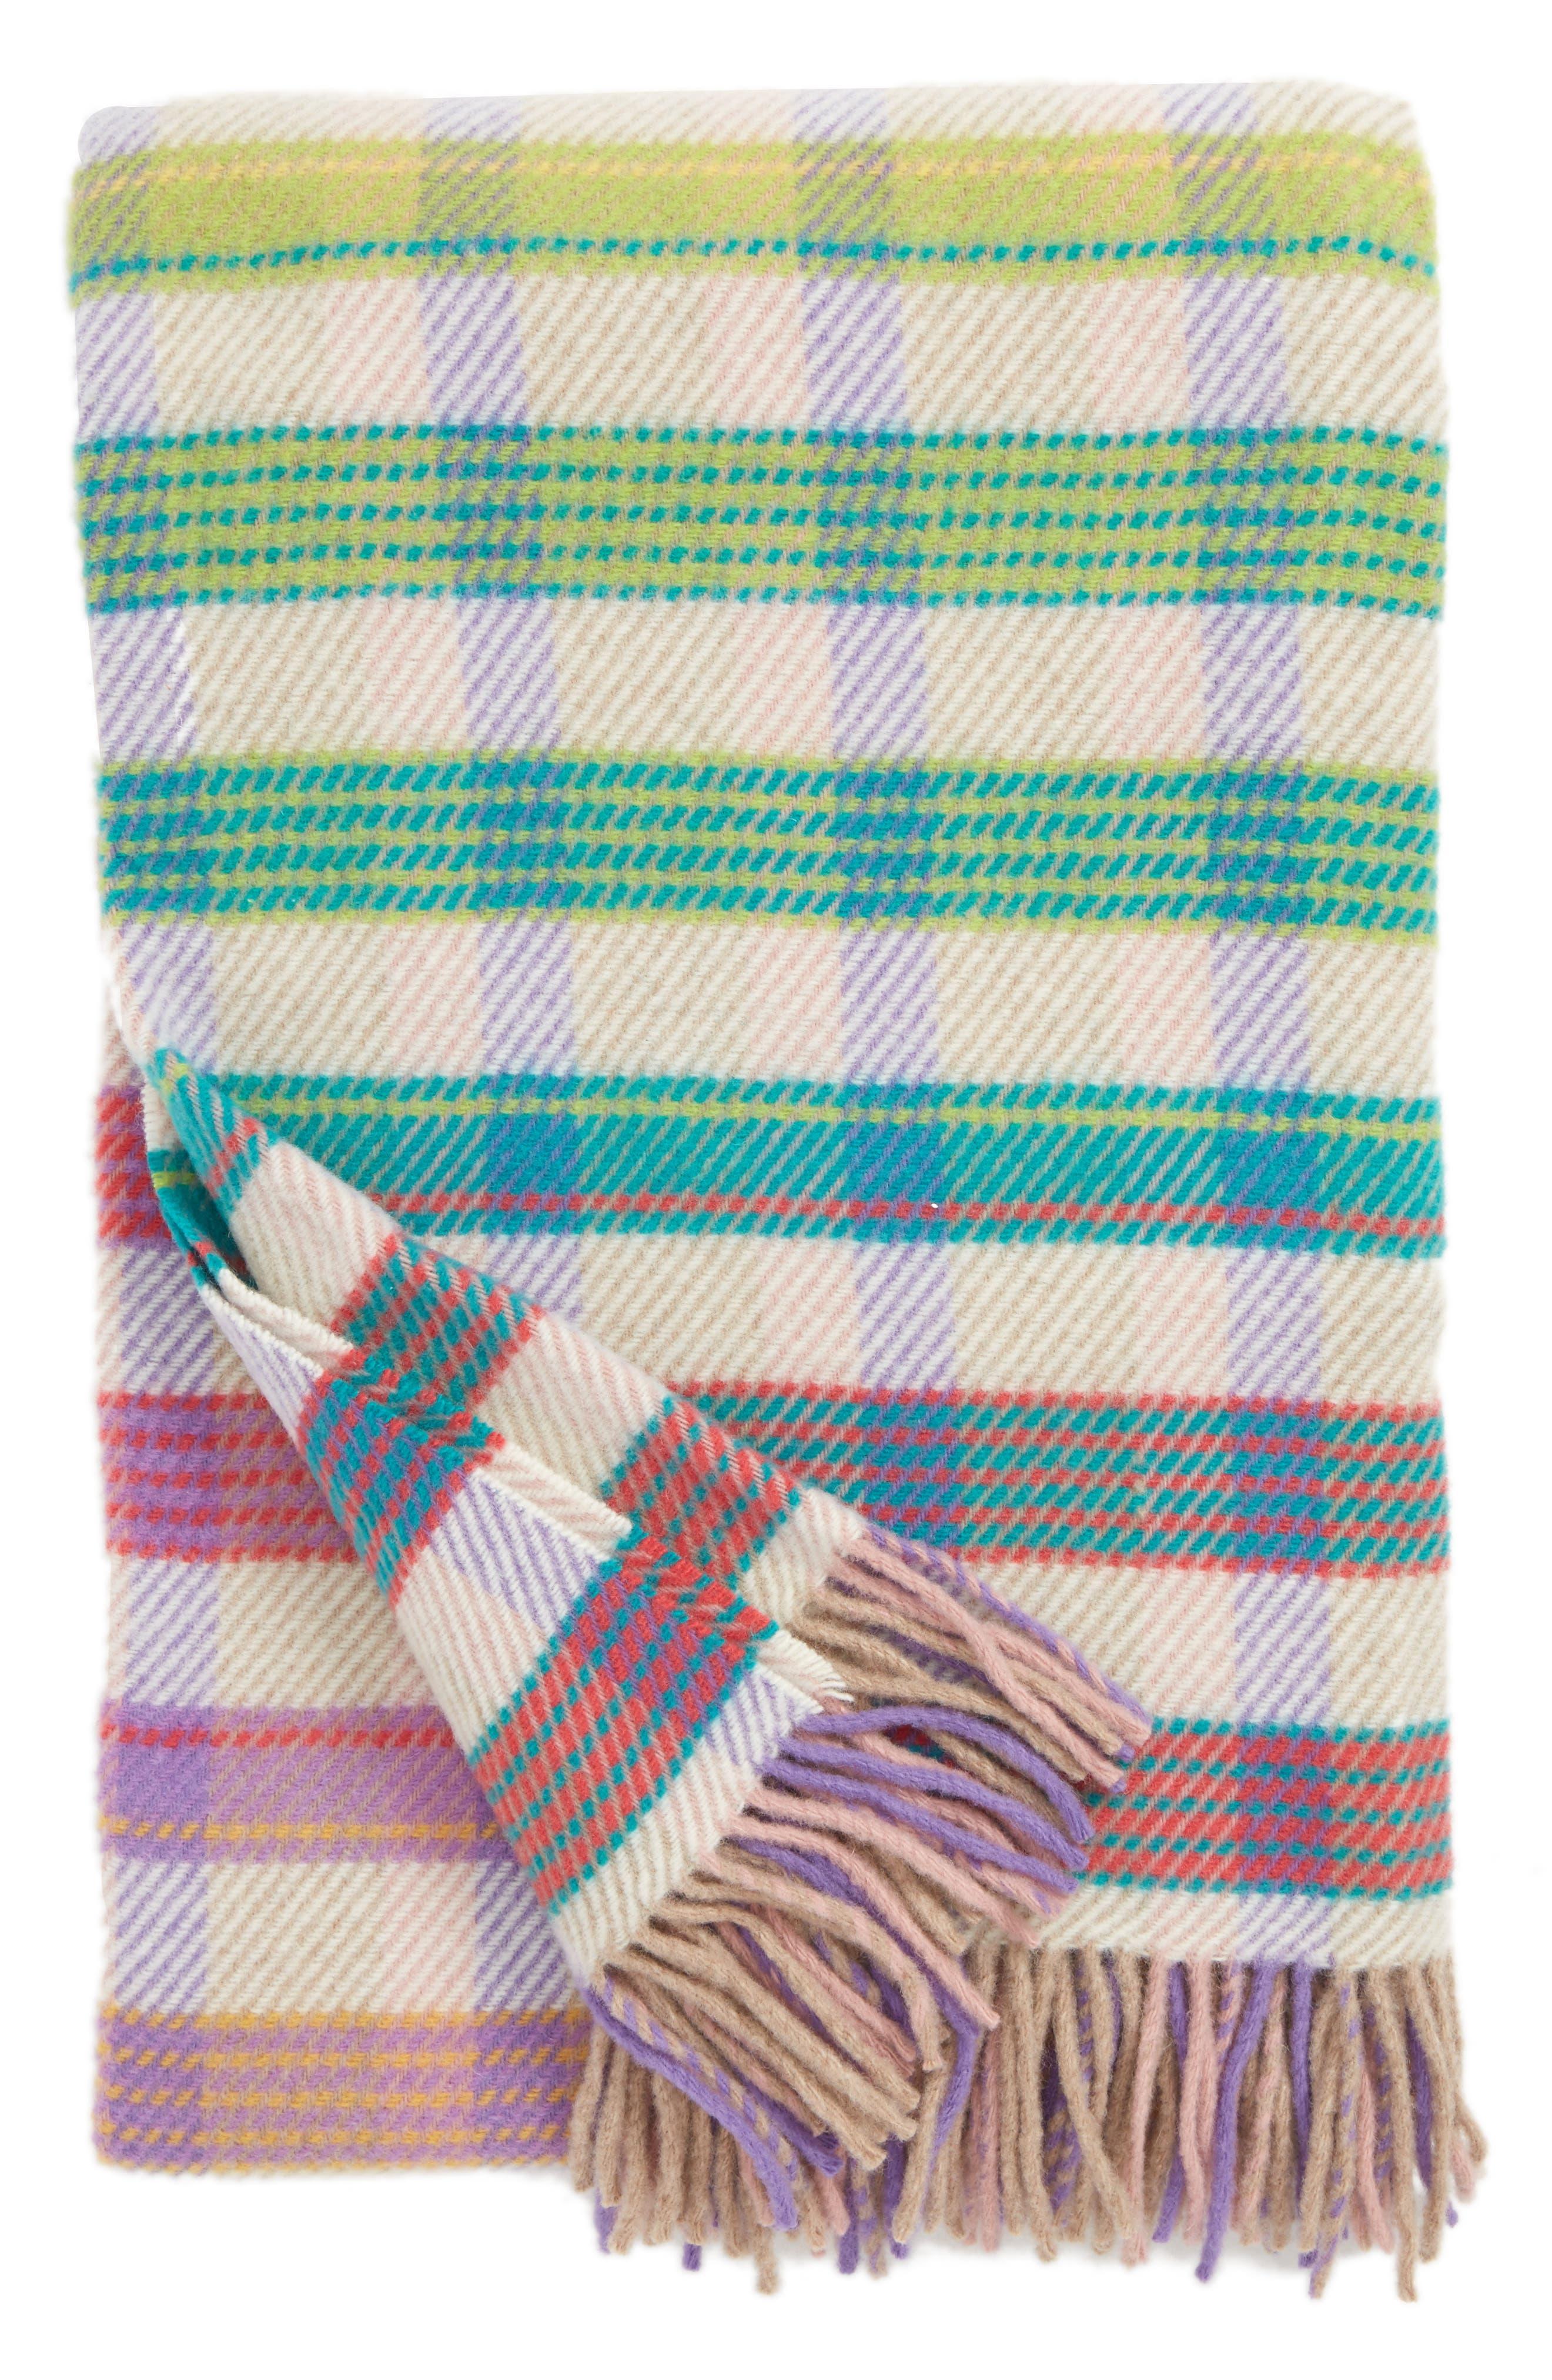 Tiziano Wool Throw Blanket,                             Main thumbnail 1, color,                             250